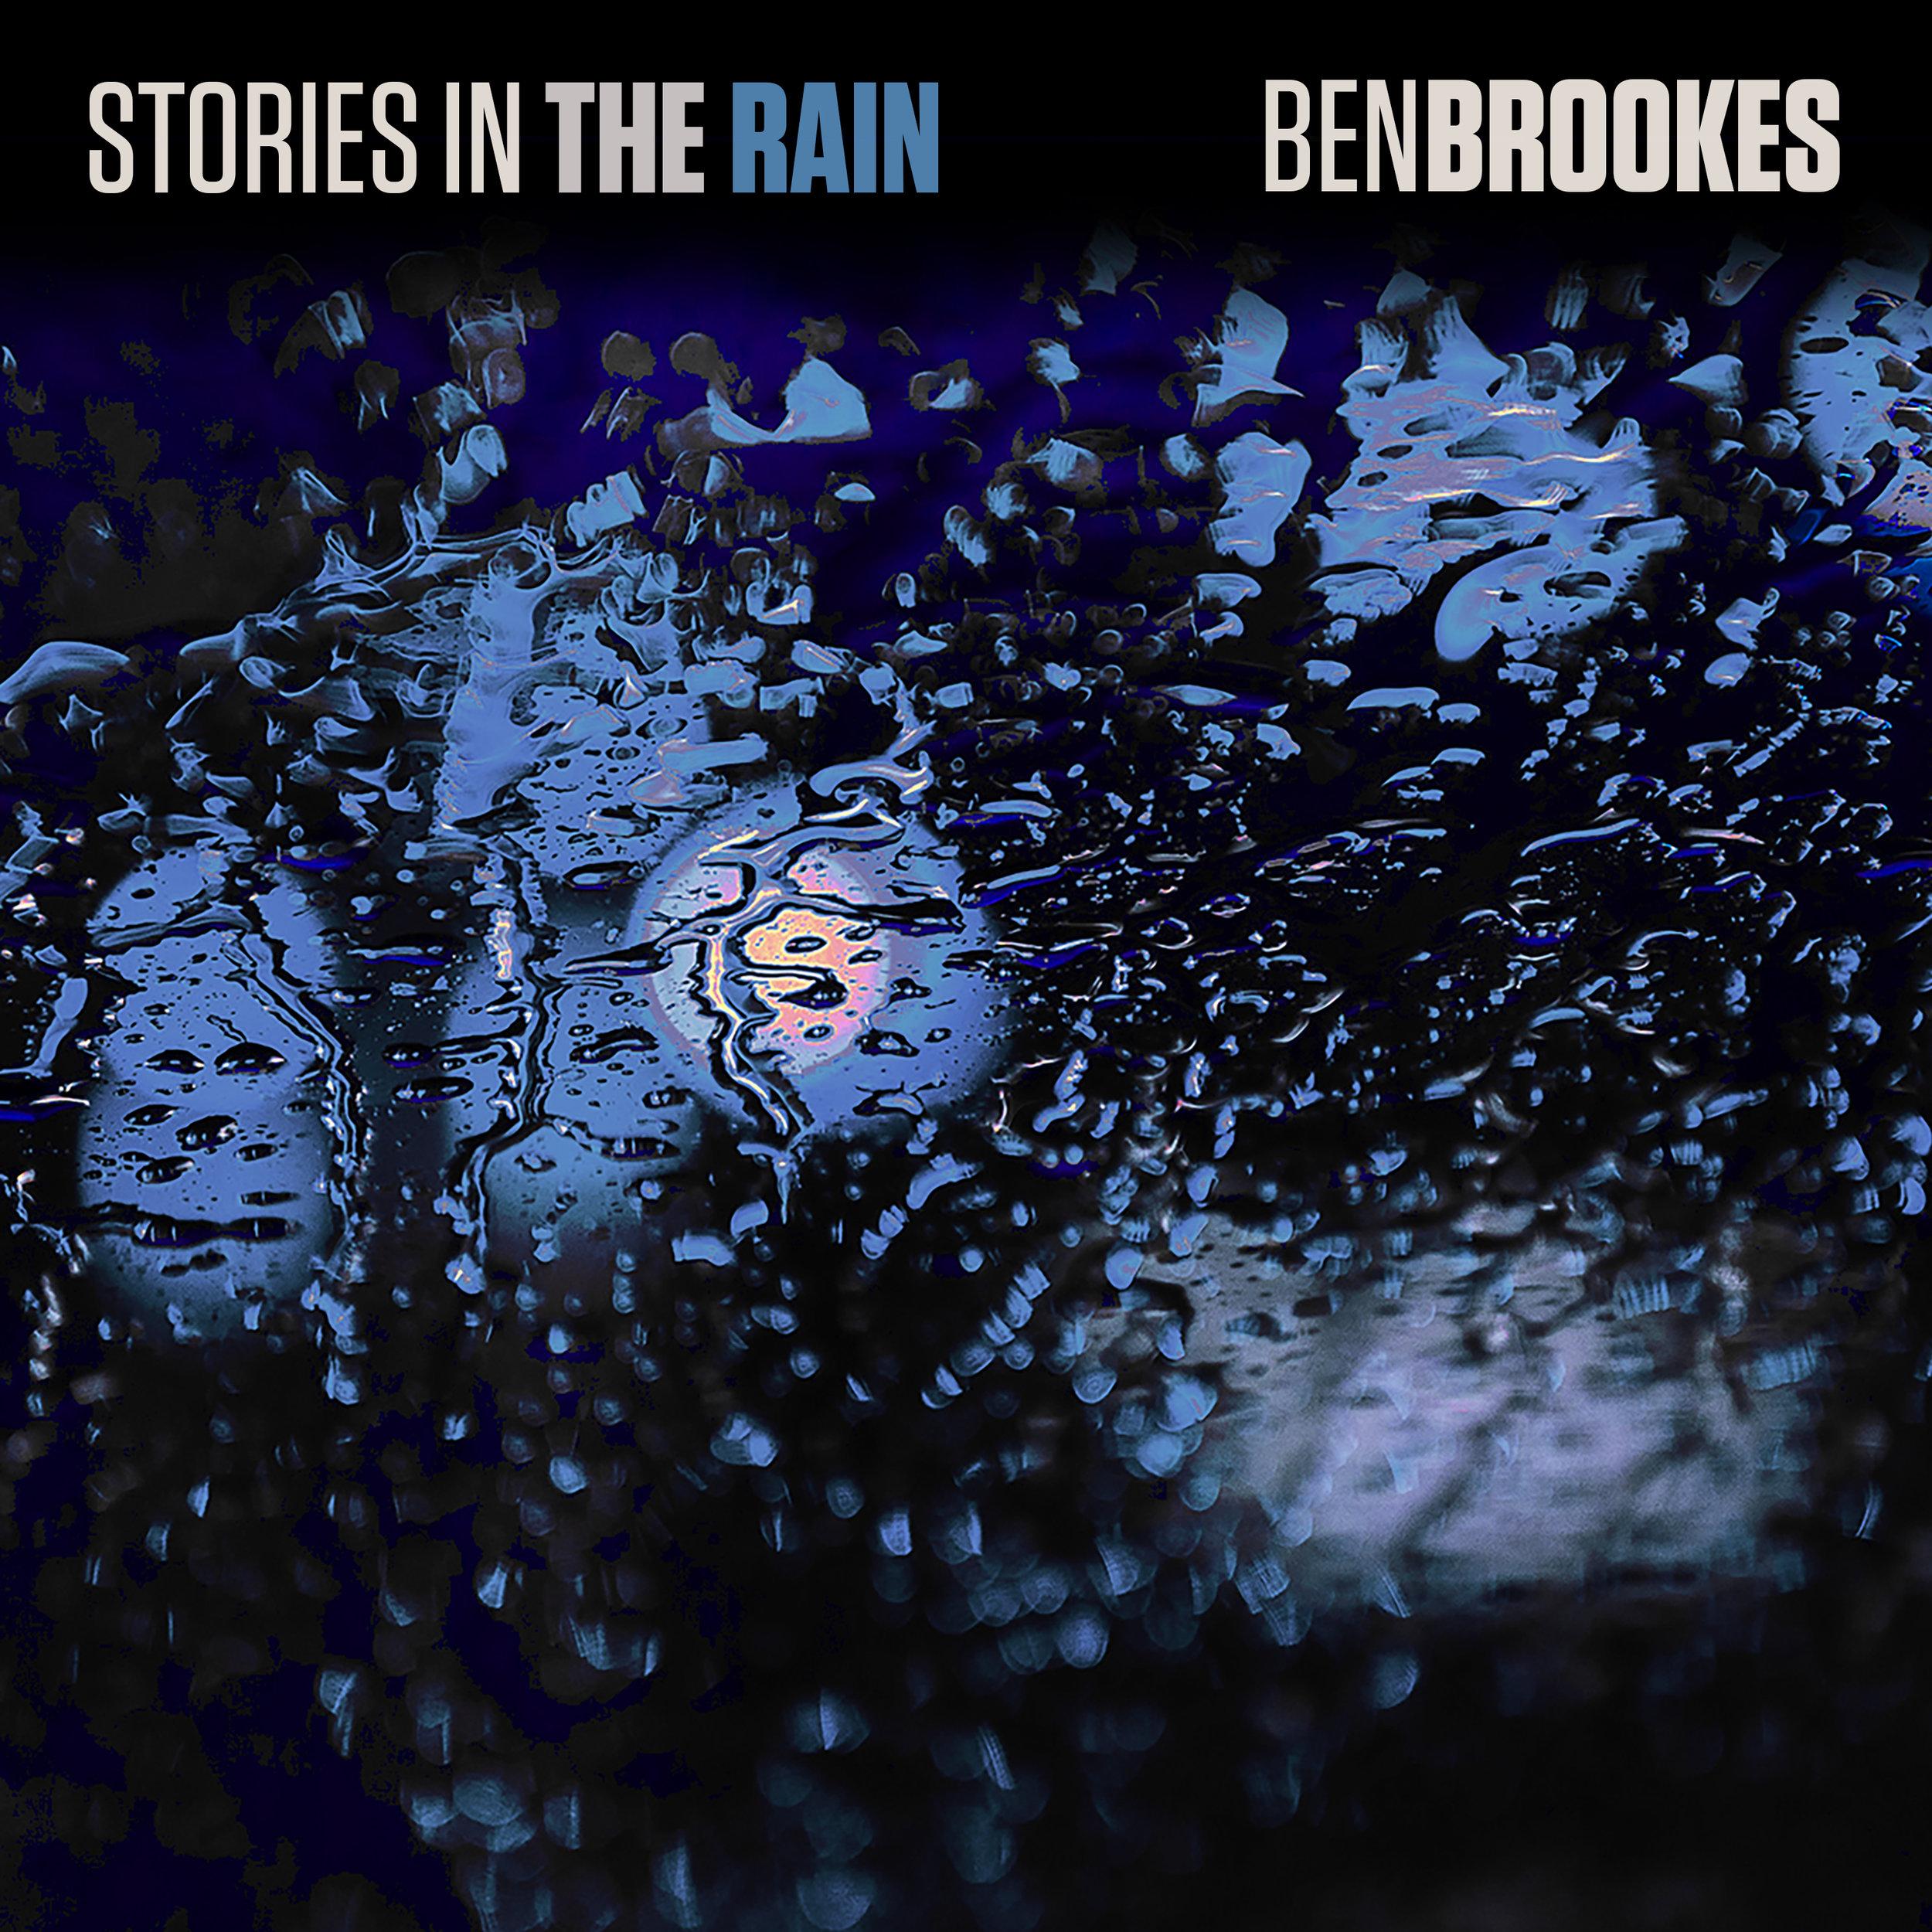 Stories in the Rain art.jpg